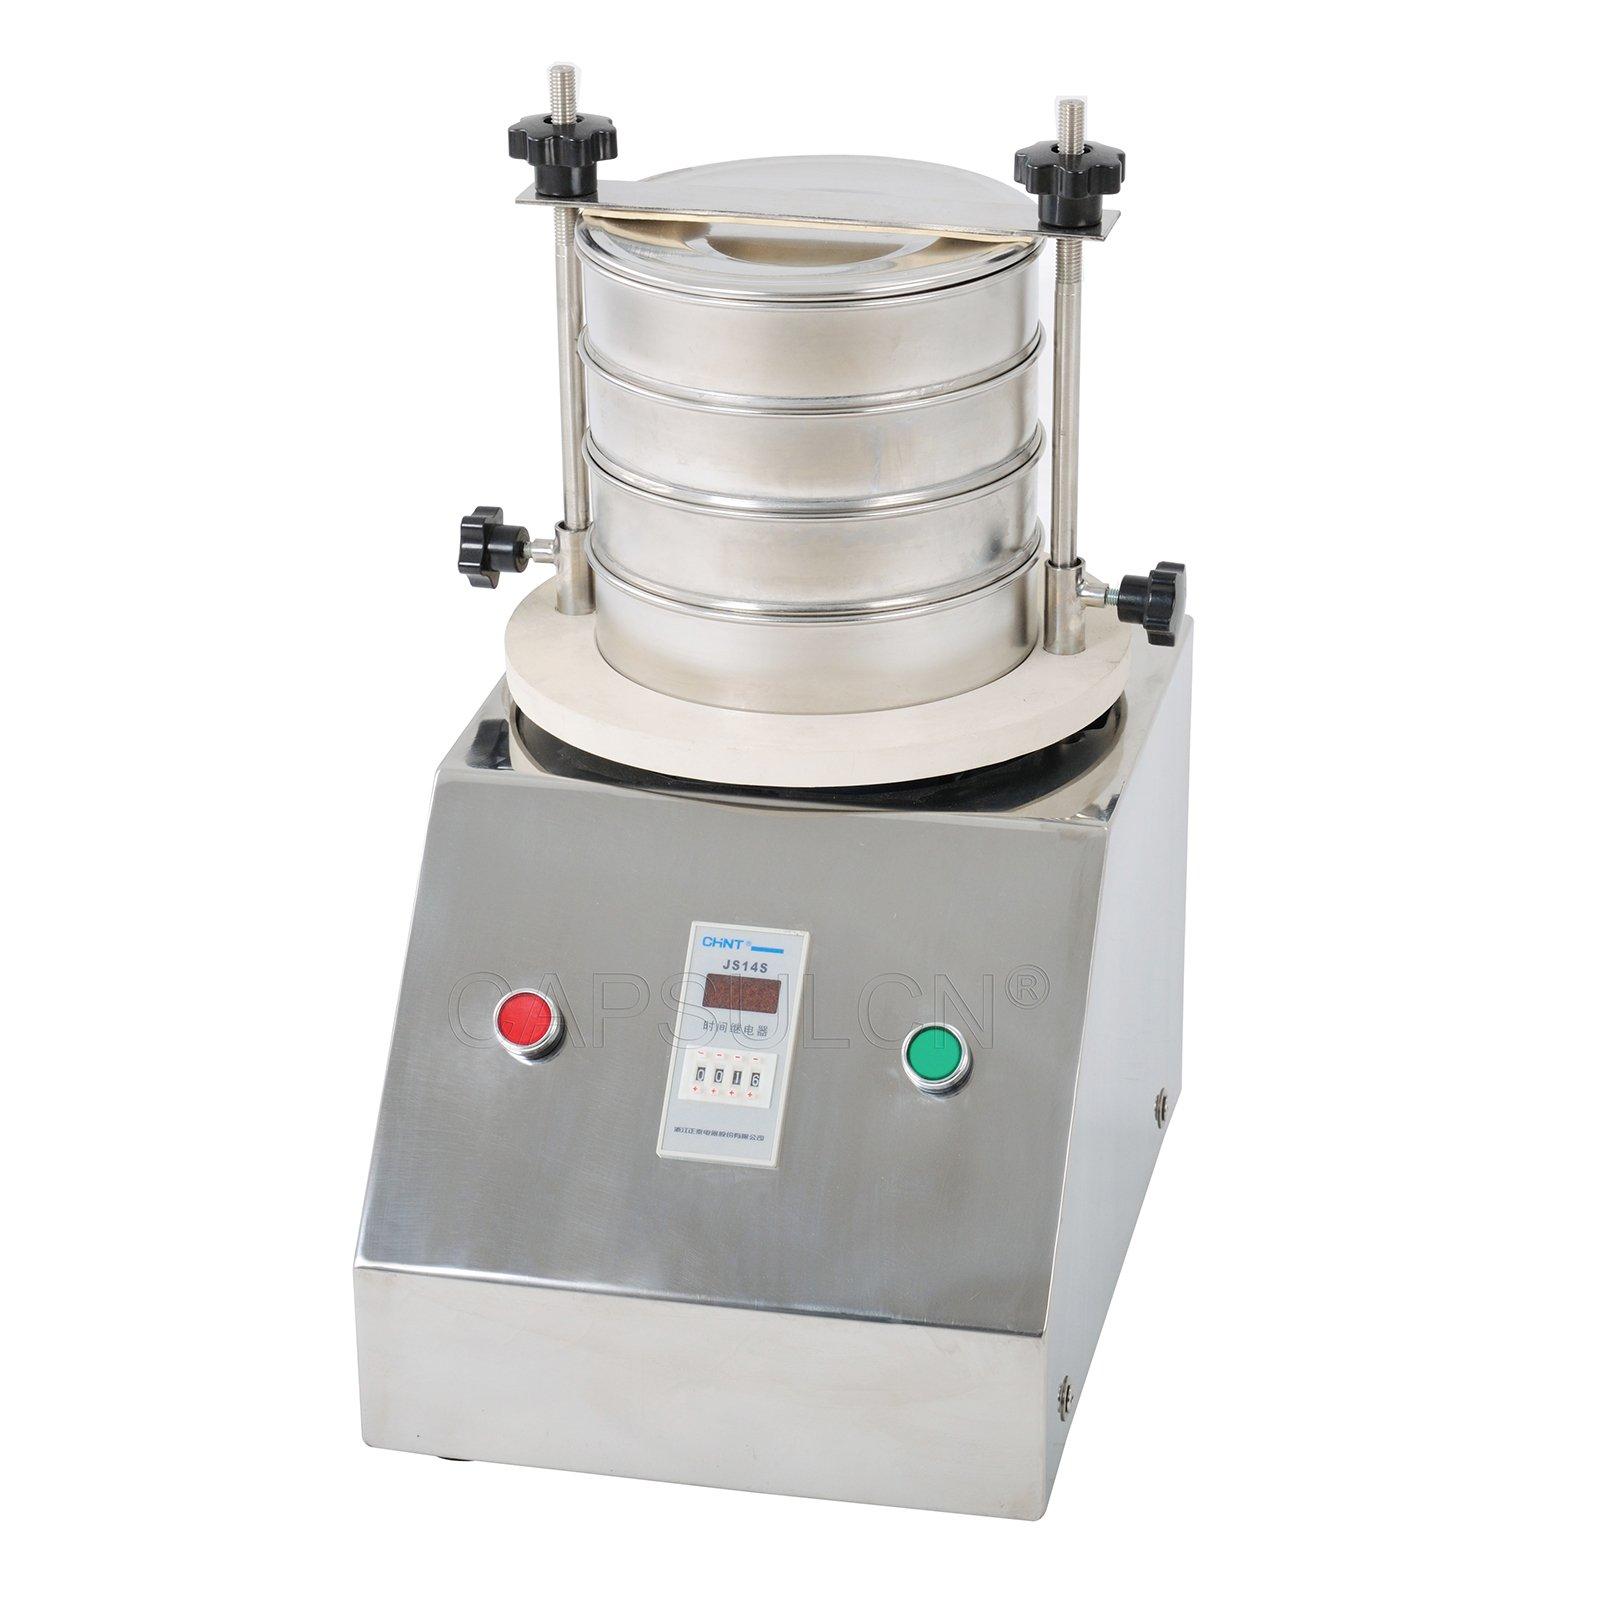 New CapsulCN. SY-300 Motorised Sieve Shaker,Powder Screening Metal Sieve Sifter Strainer with 4 Layer;220V/50Hz